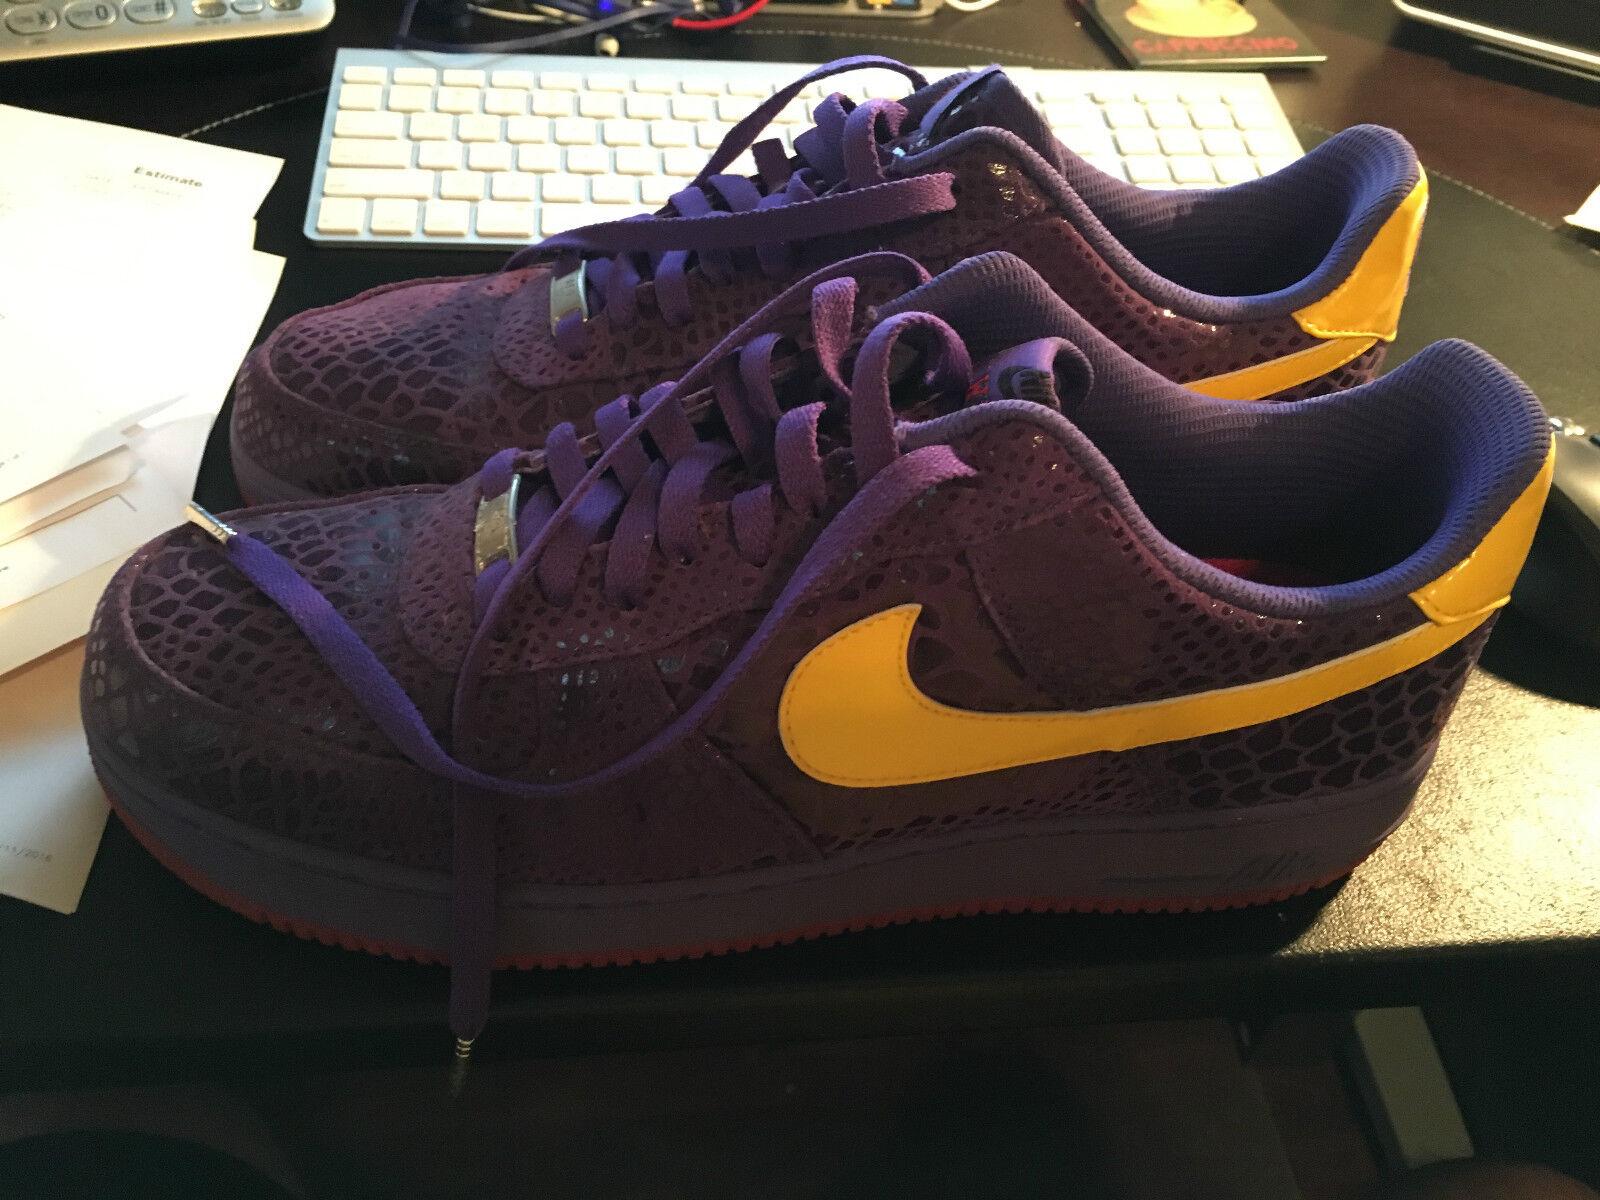 Eddie Cruz Nike Air Force 1 Supreme West Coast 0,44 marca Sticky Rubber Kobe Lakers marca 0,44 de descuento 254c9a